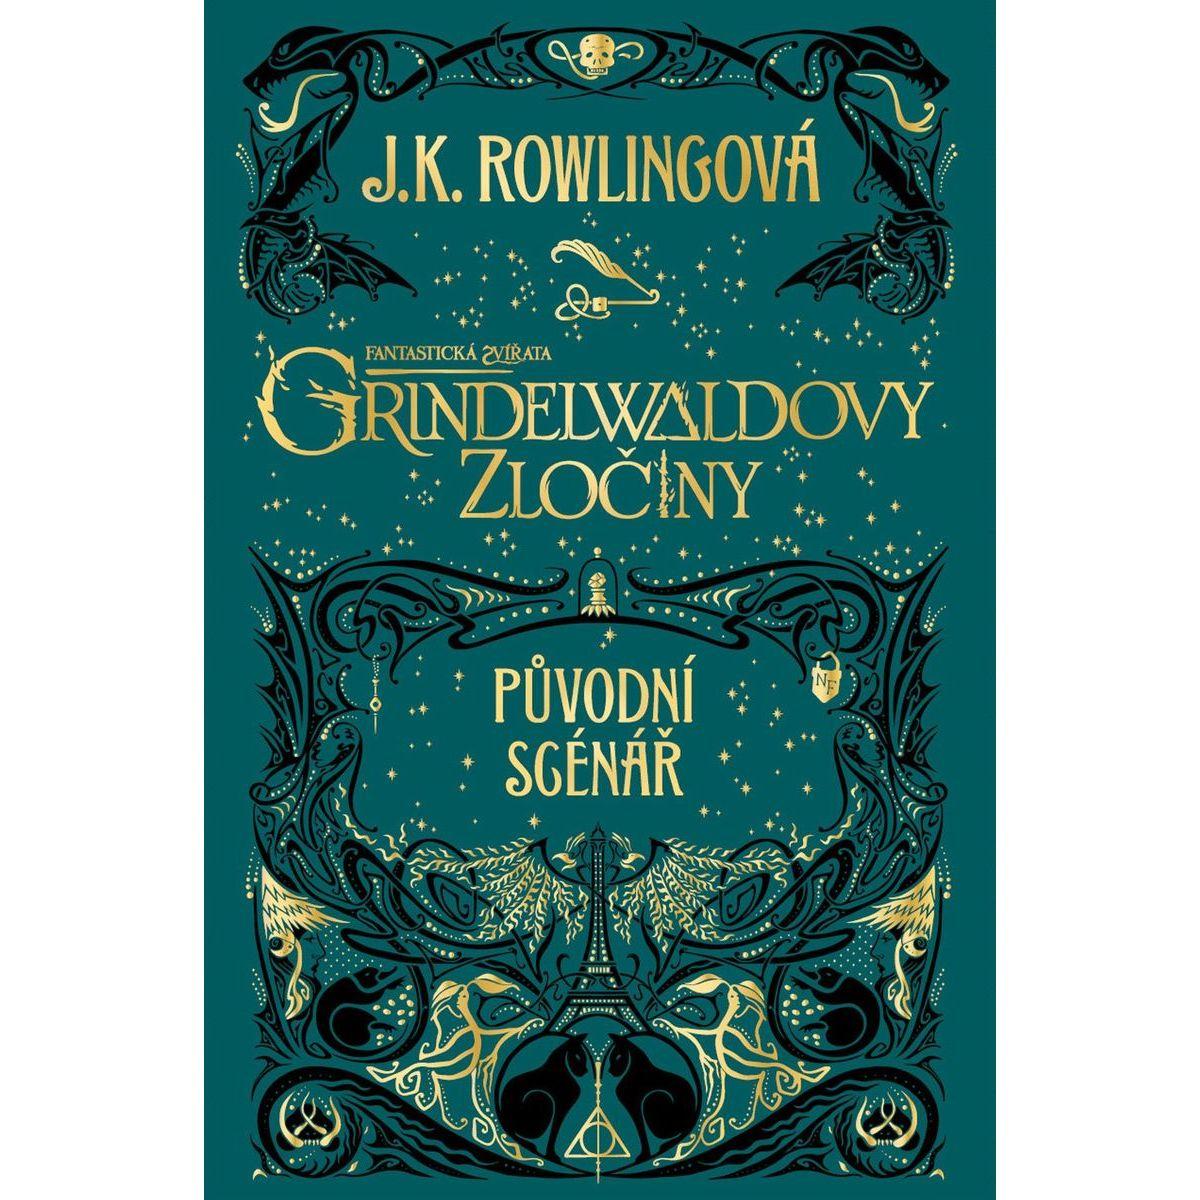 Fantastická zvieratá Grindelwaldove zločiny pôvodný scenár